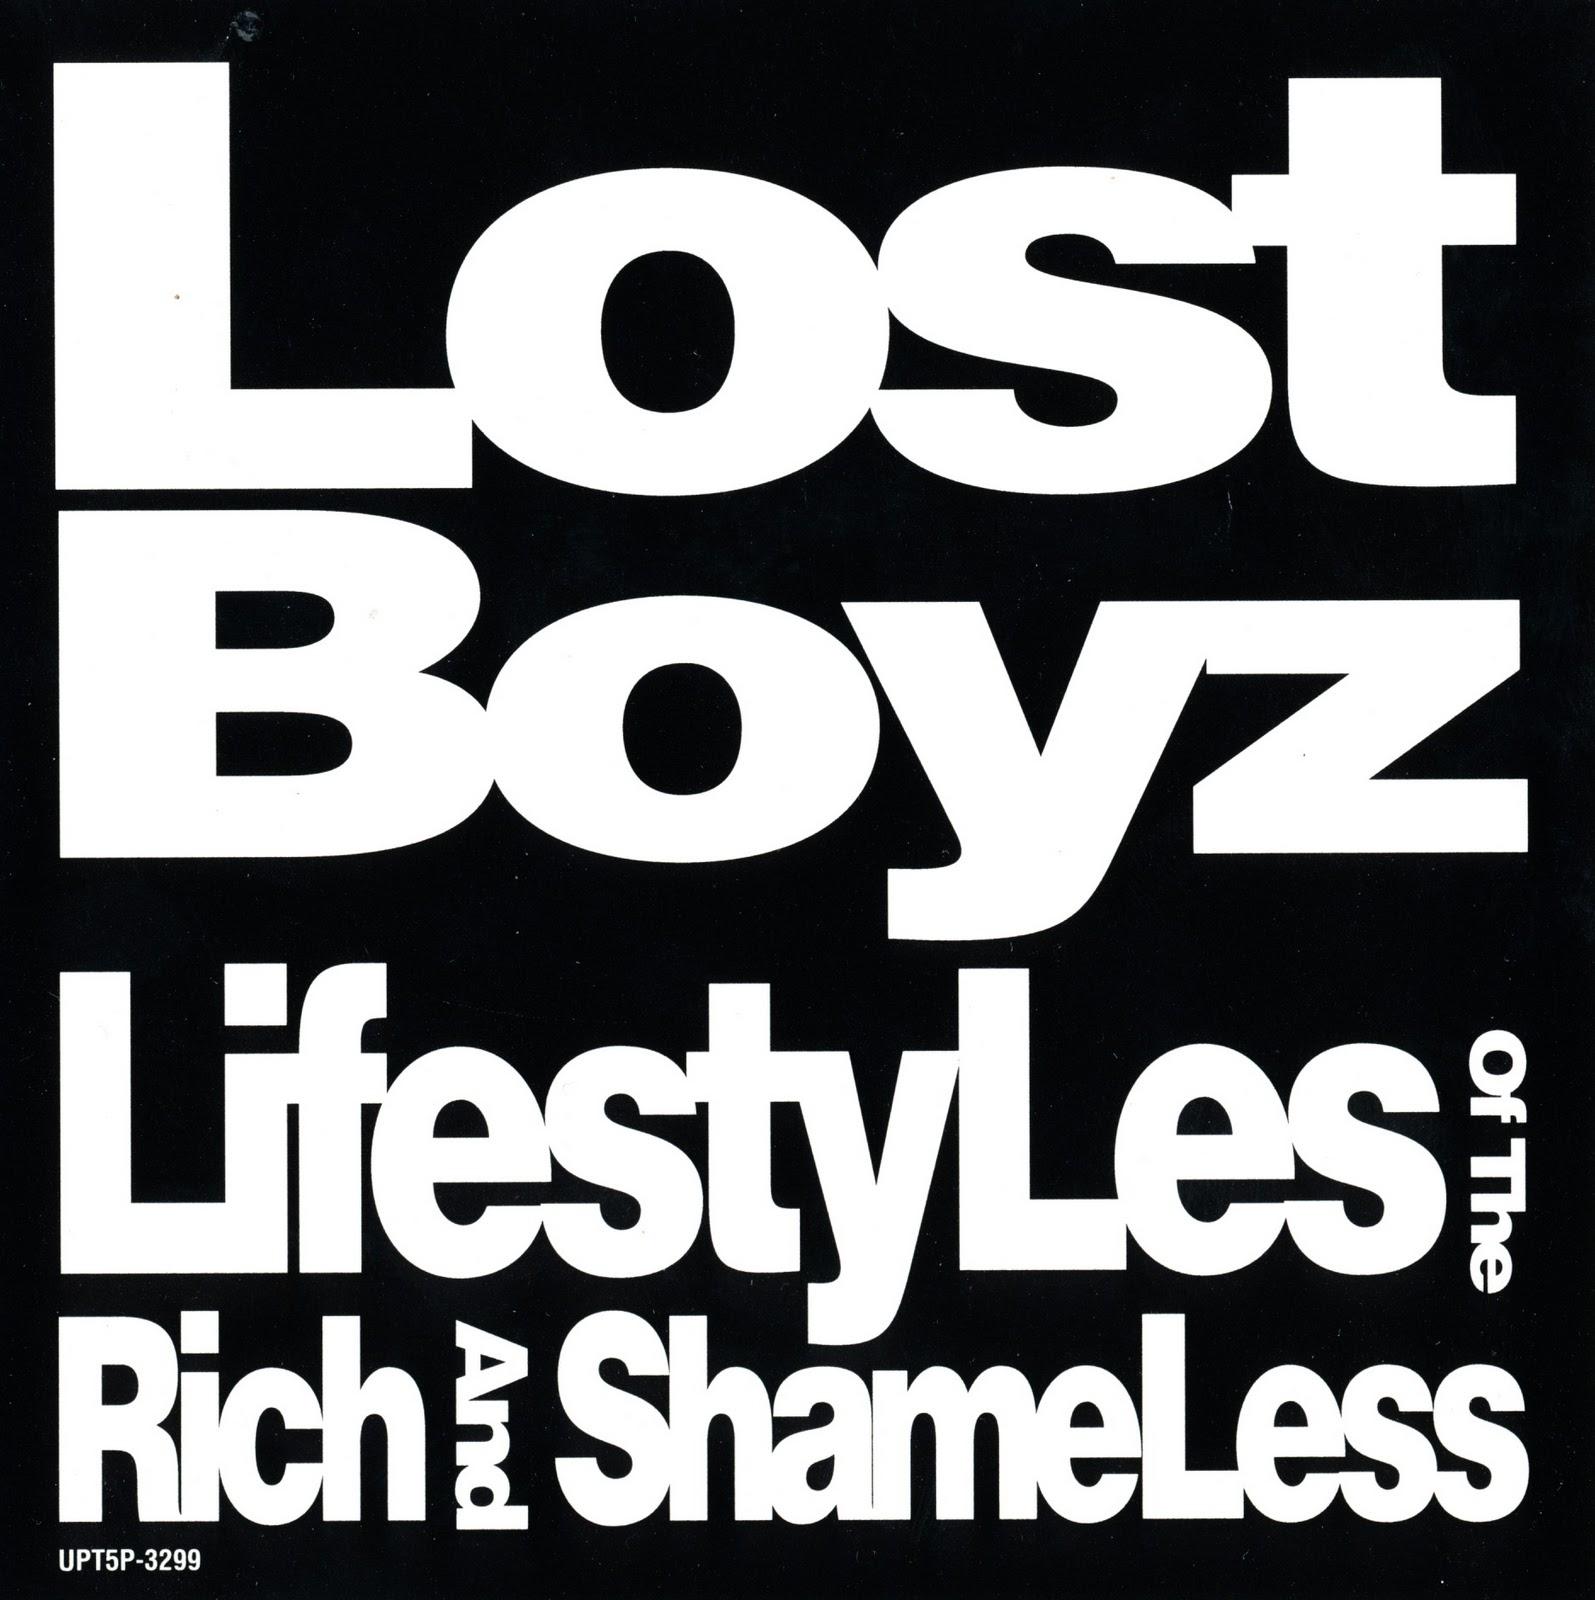 http://4.bp.blogspot.com/-9WFq2EwUjDA/Tnzej8JVxvI/AAAAAAAACbw/dKXjxcUep2A/s1600/Lost+Boys+LifeFR_0010.jpg